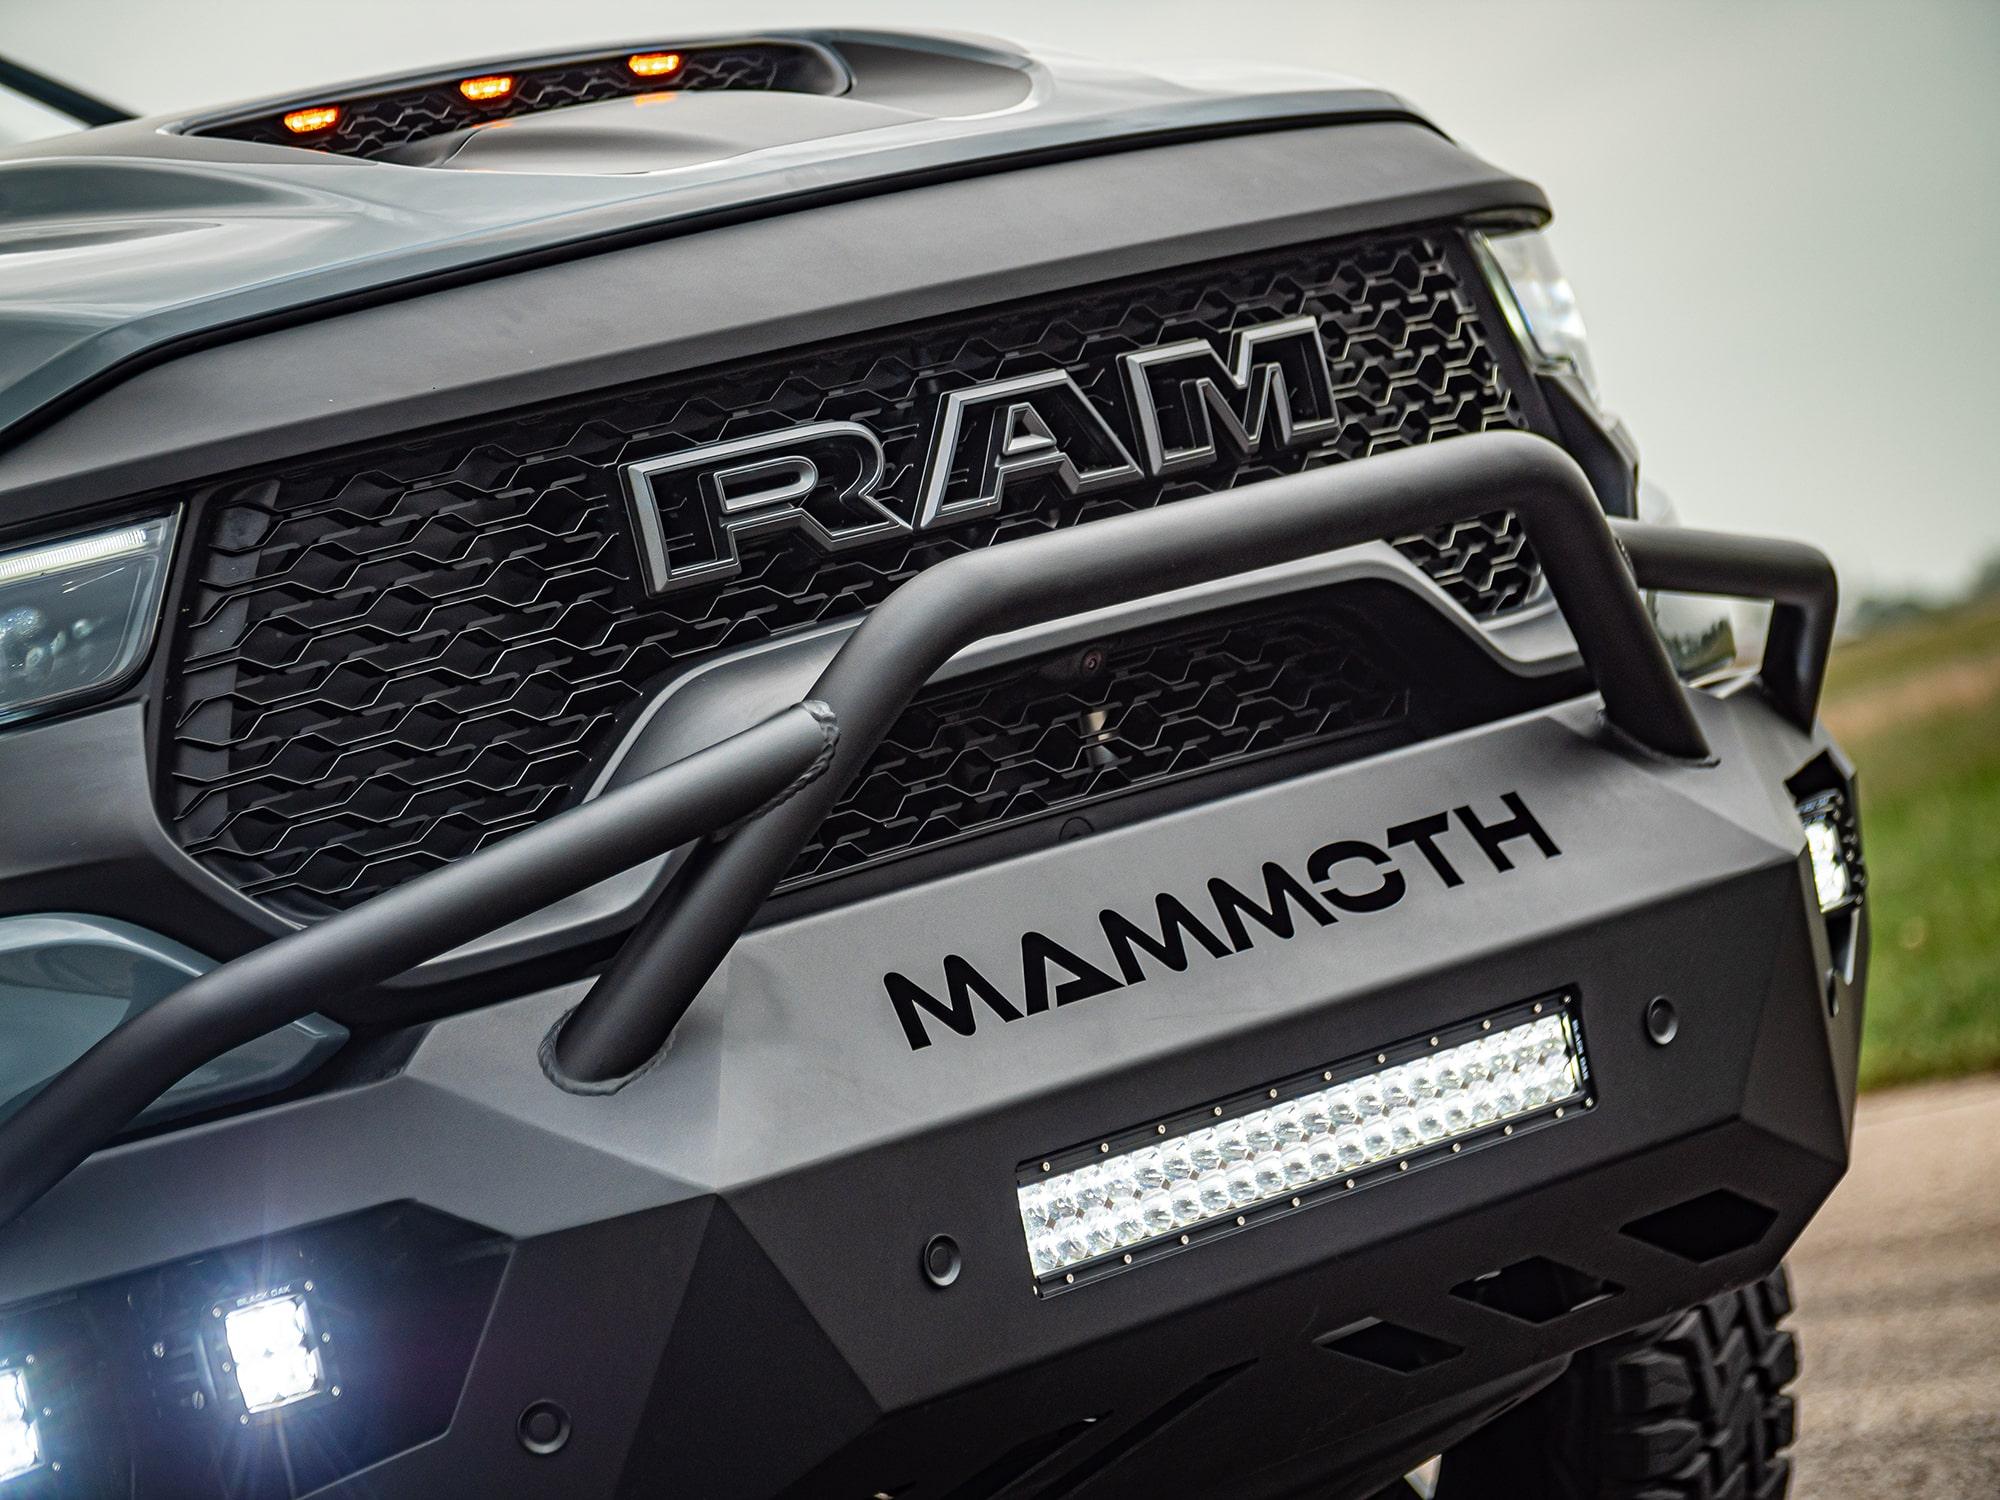 2021 RAM TRX MAMMOTH 900 For Sale